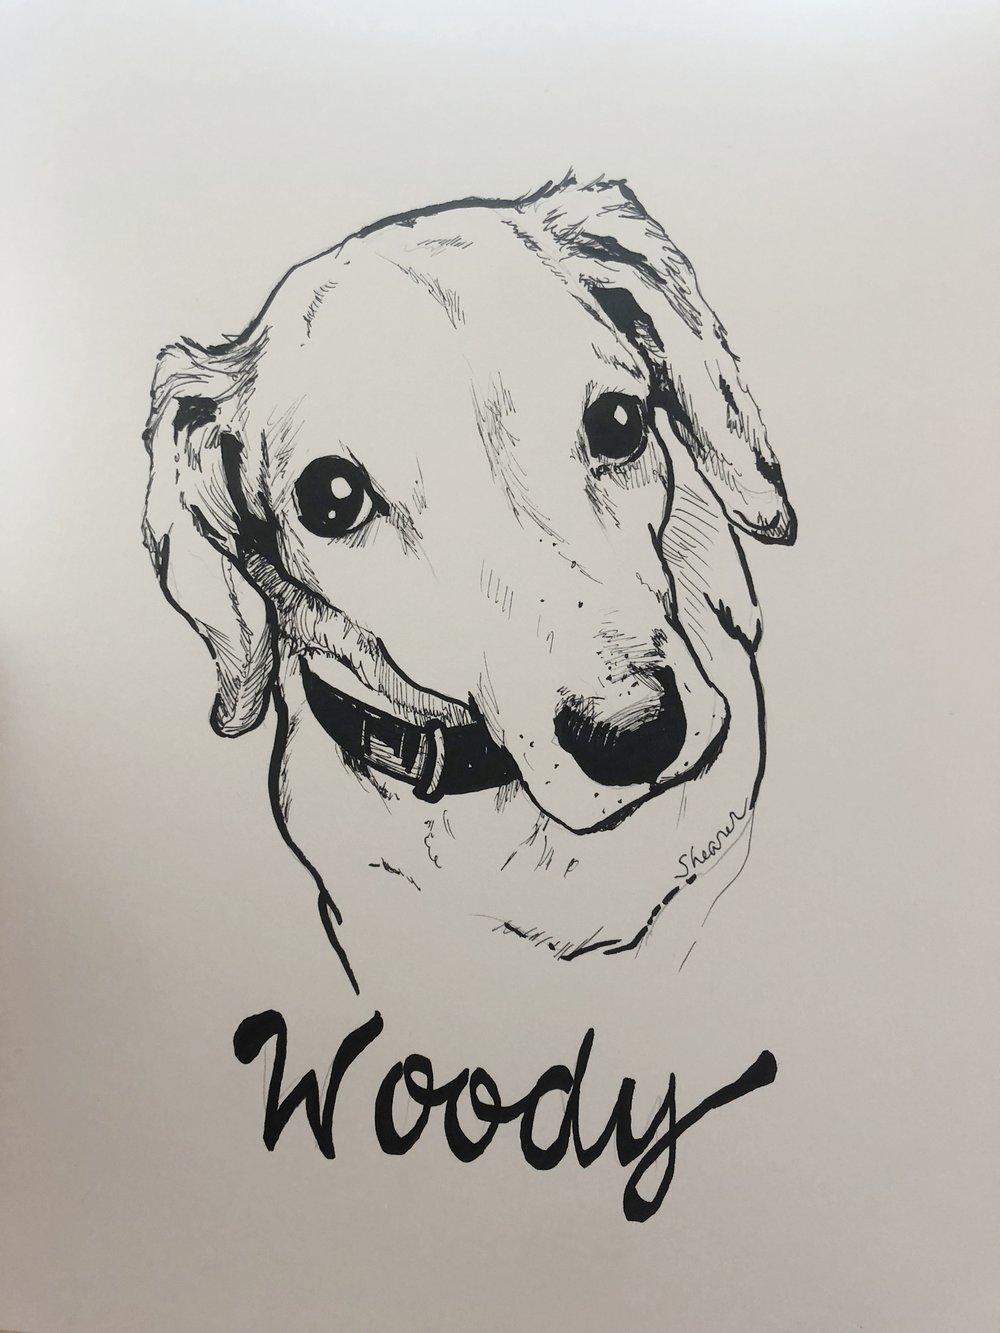 Woody.jpeg